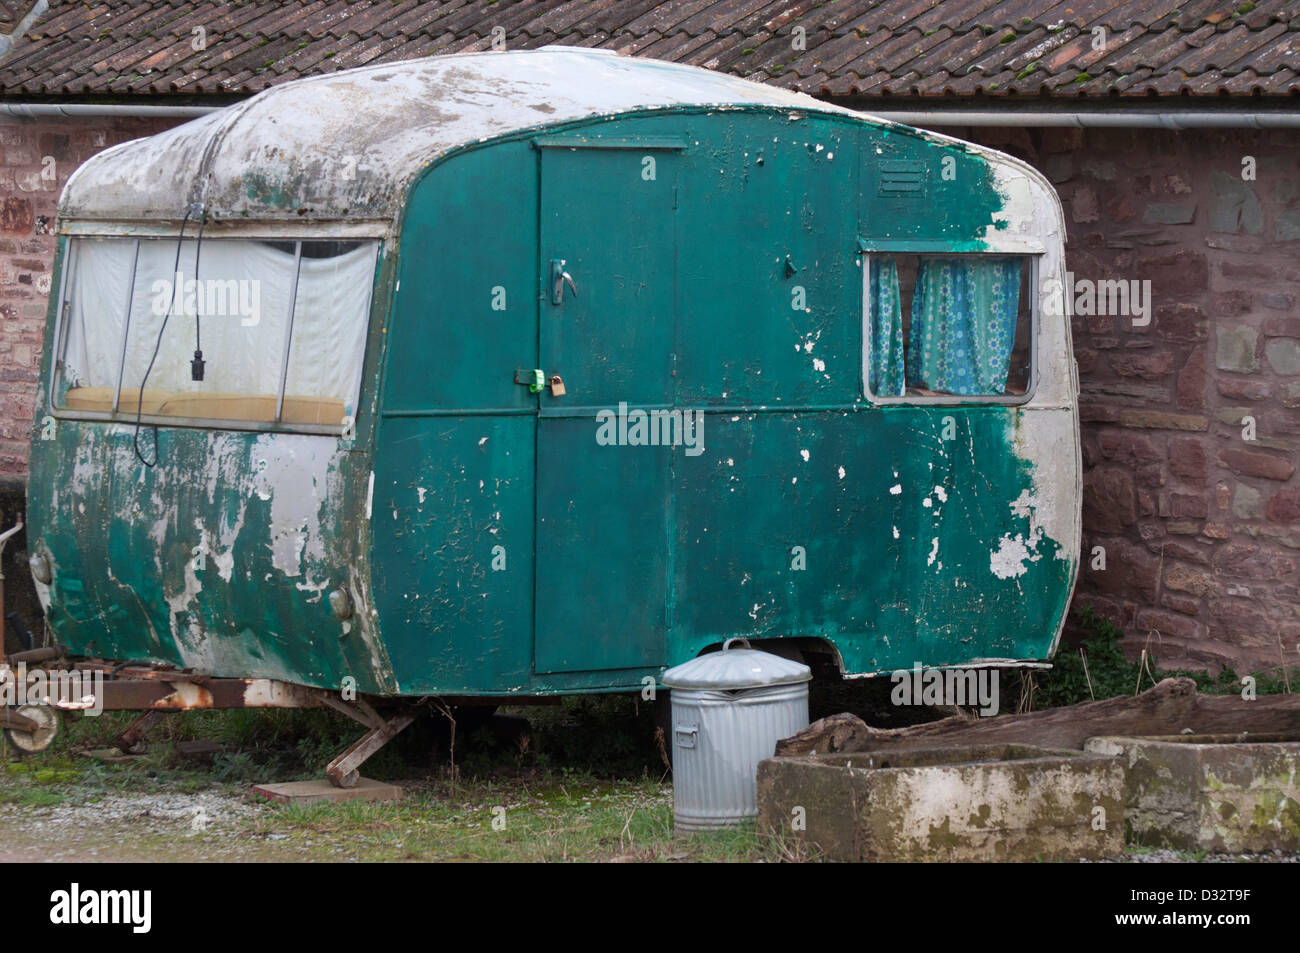 old caravan, abandoned, derelict, decrepit, peeling paintwork. disused, Stock Photo